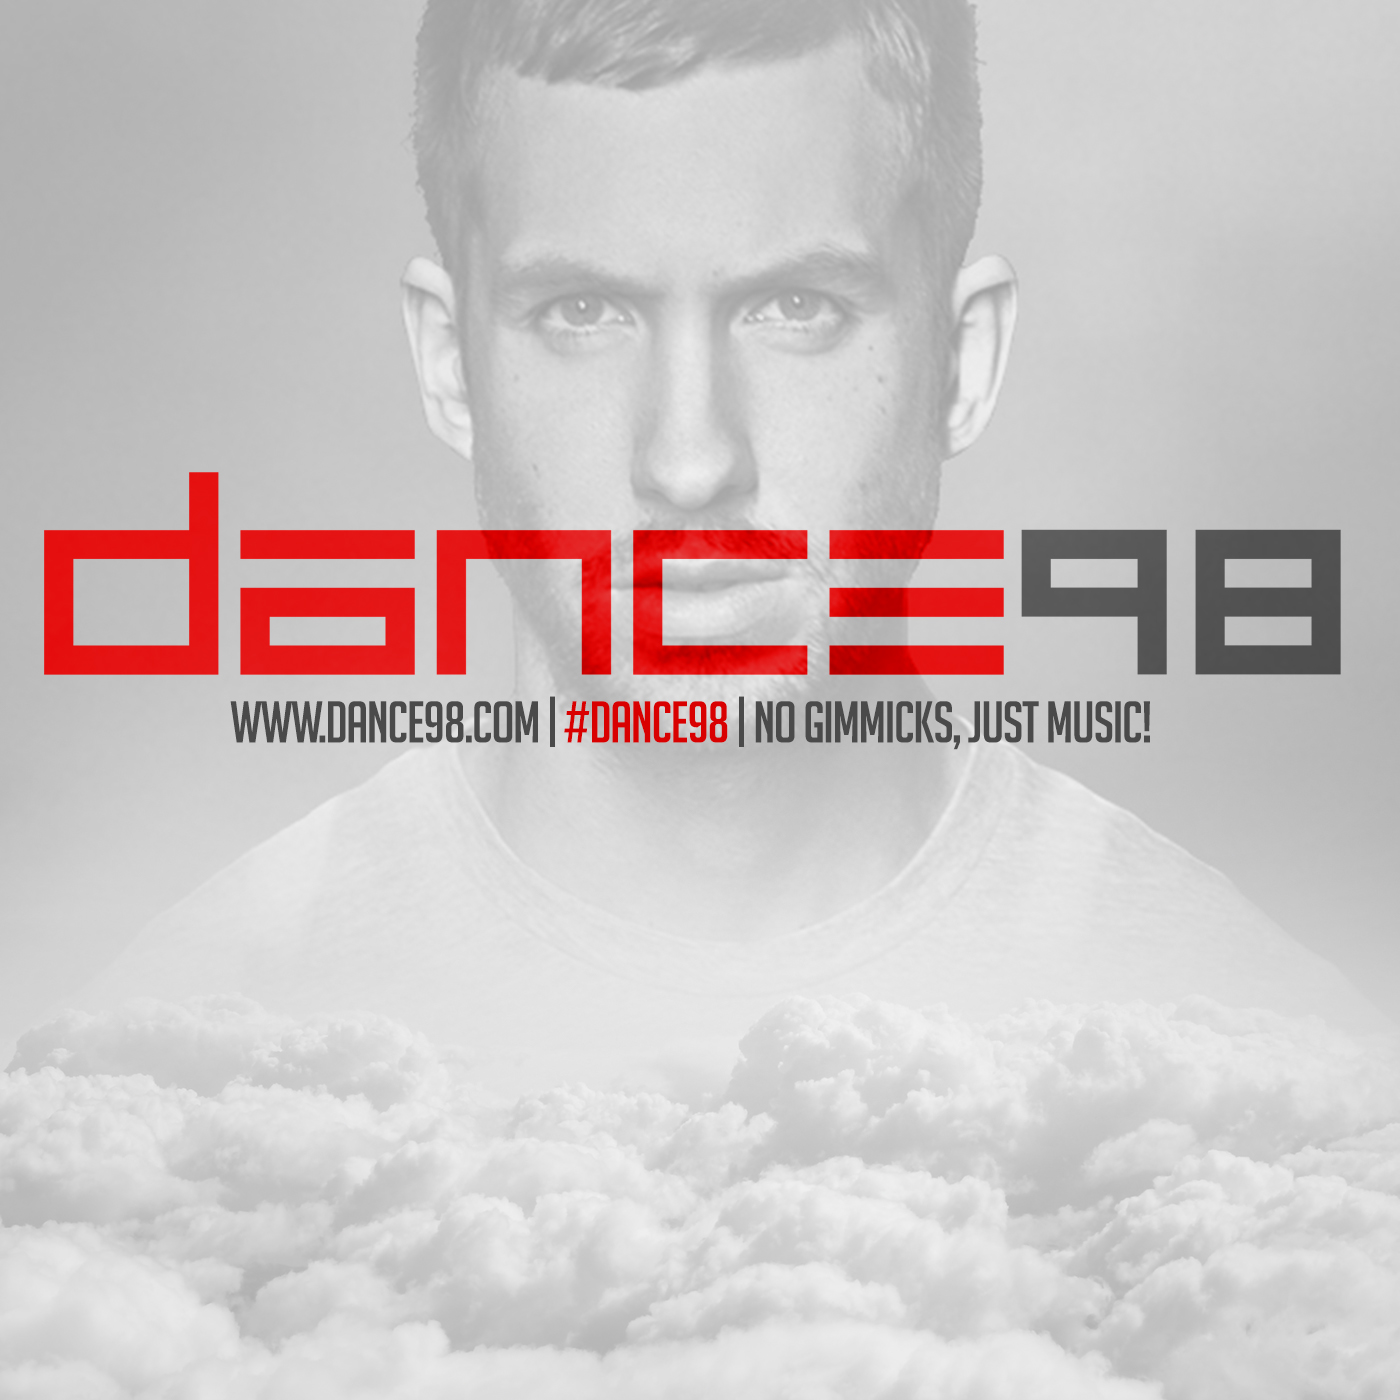 Dance 98 | #1 Dance Pop Hits | 64k | www.dance98.com